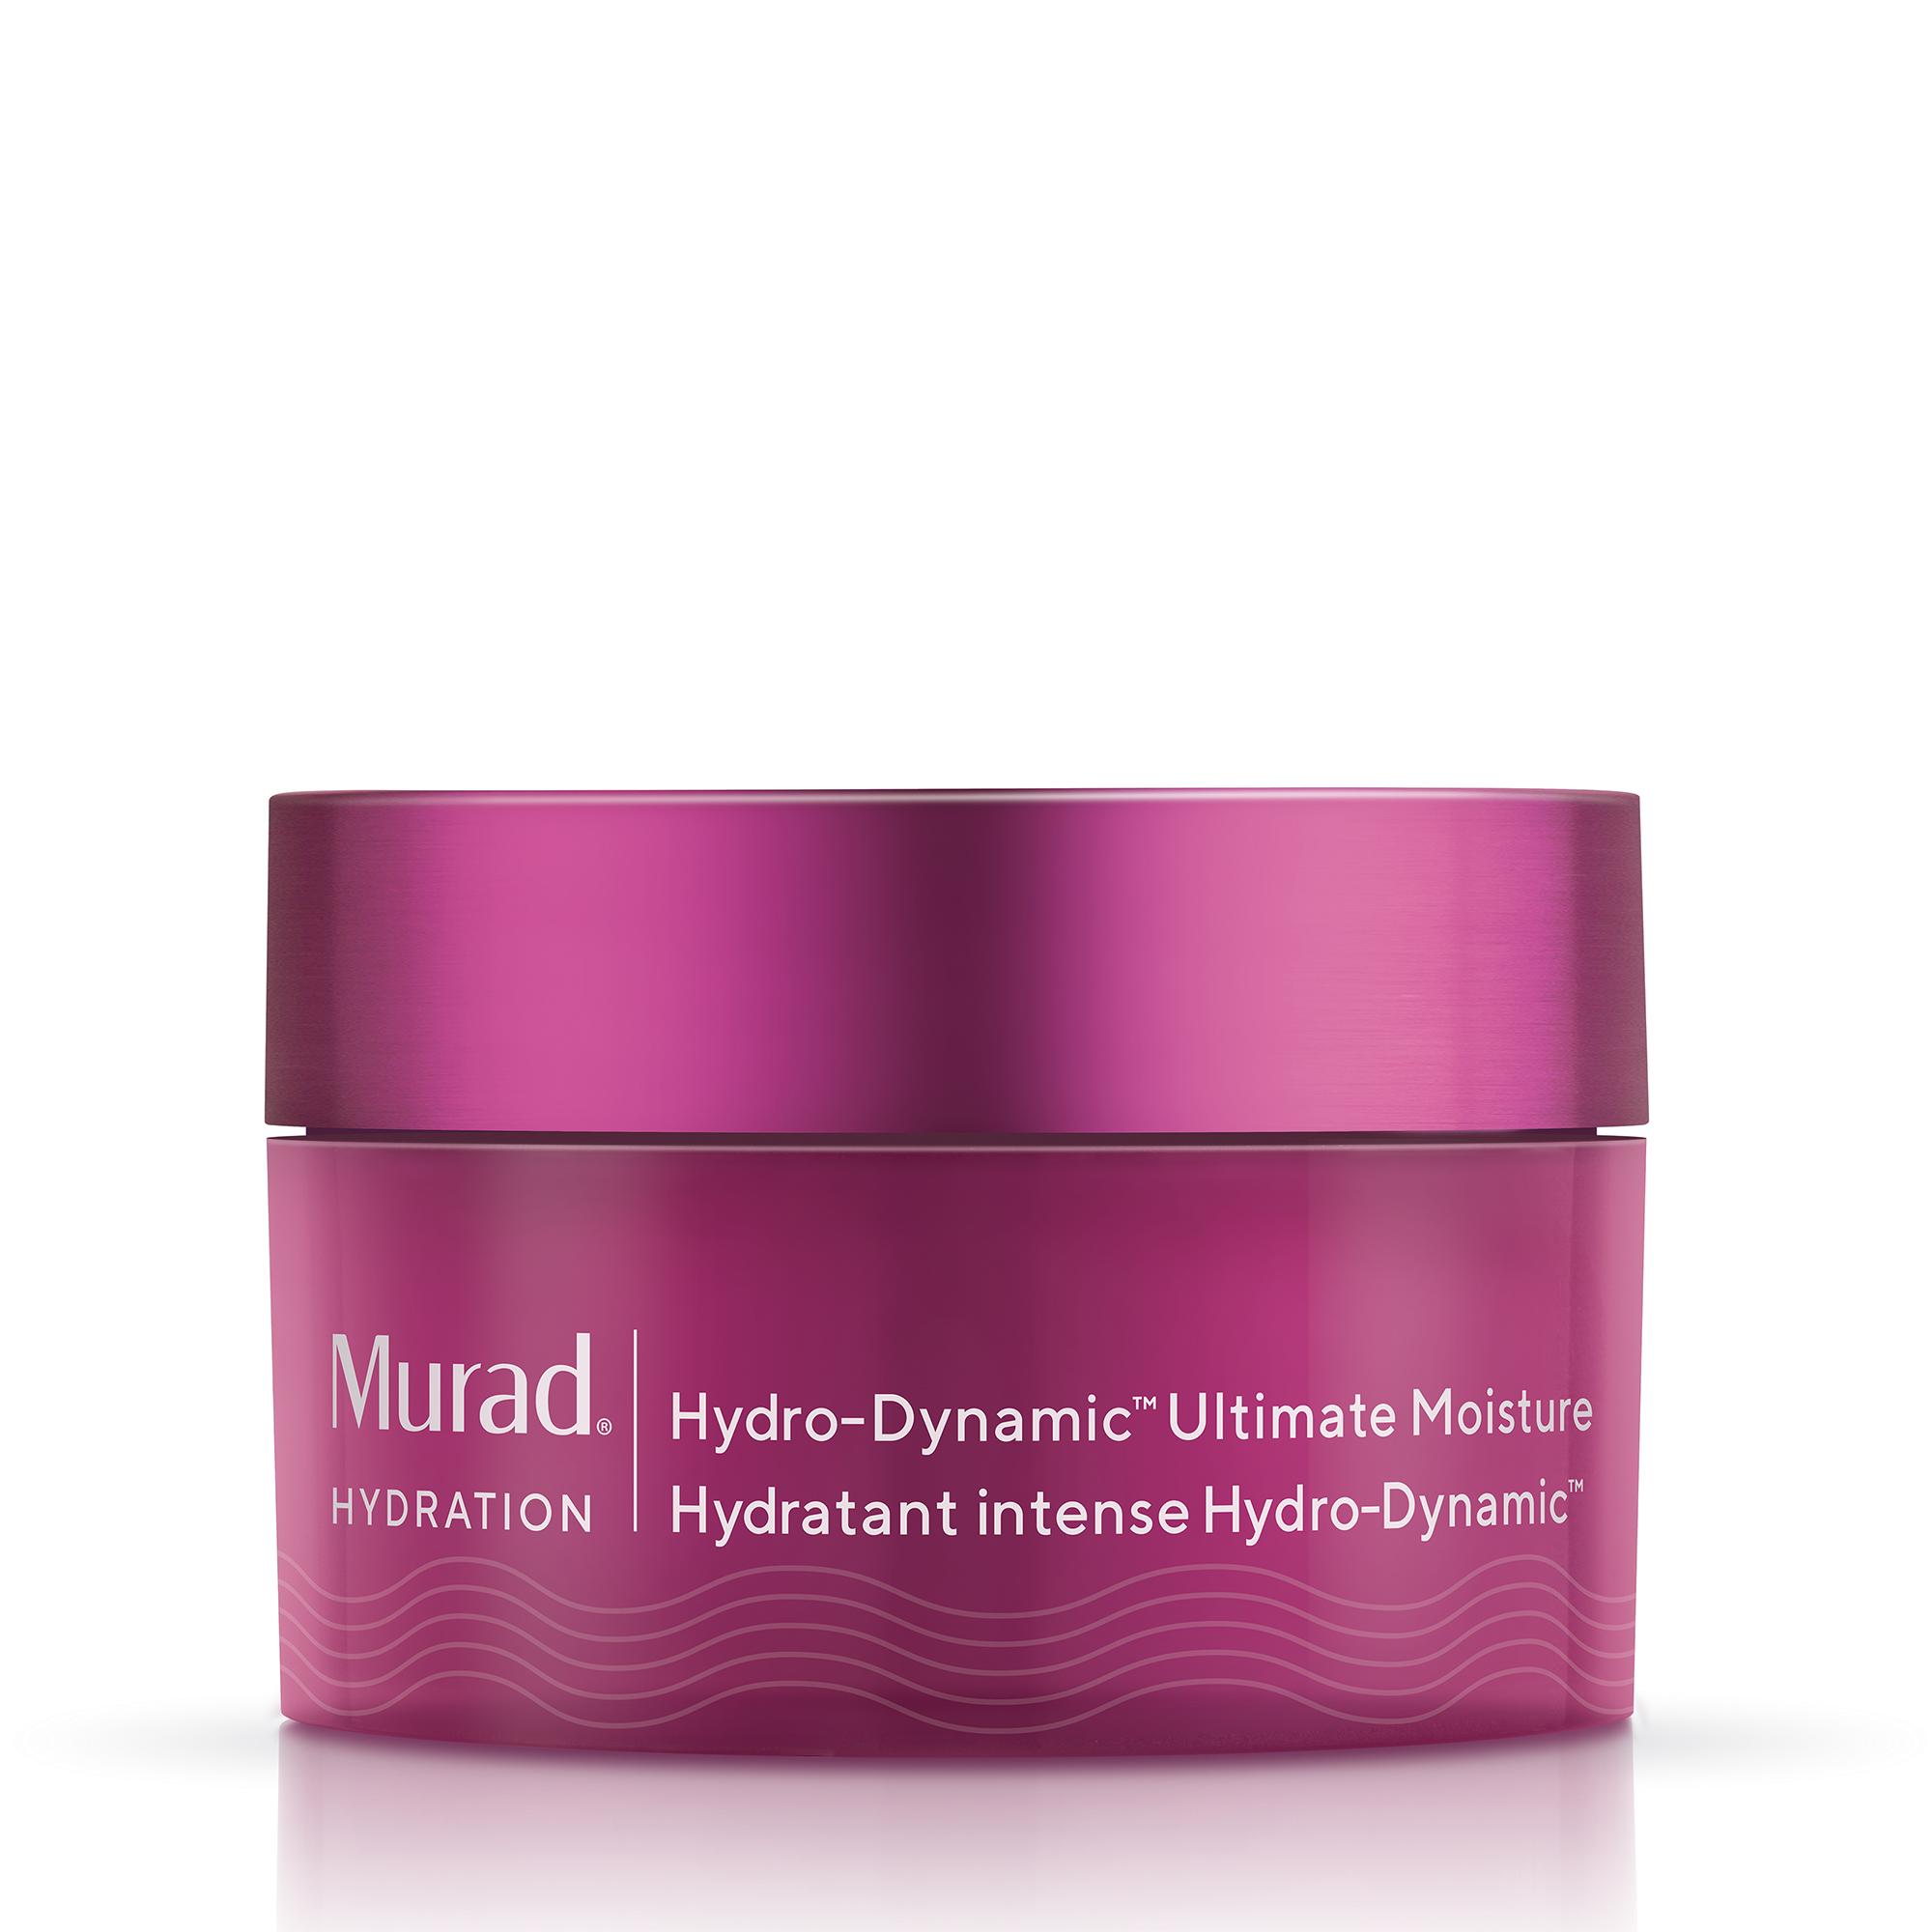 Murad Hydration Dynamic Ultimate Moistures, 50 ml